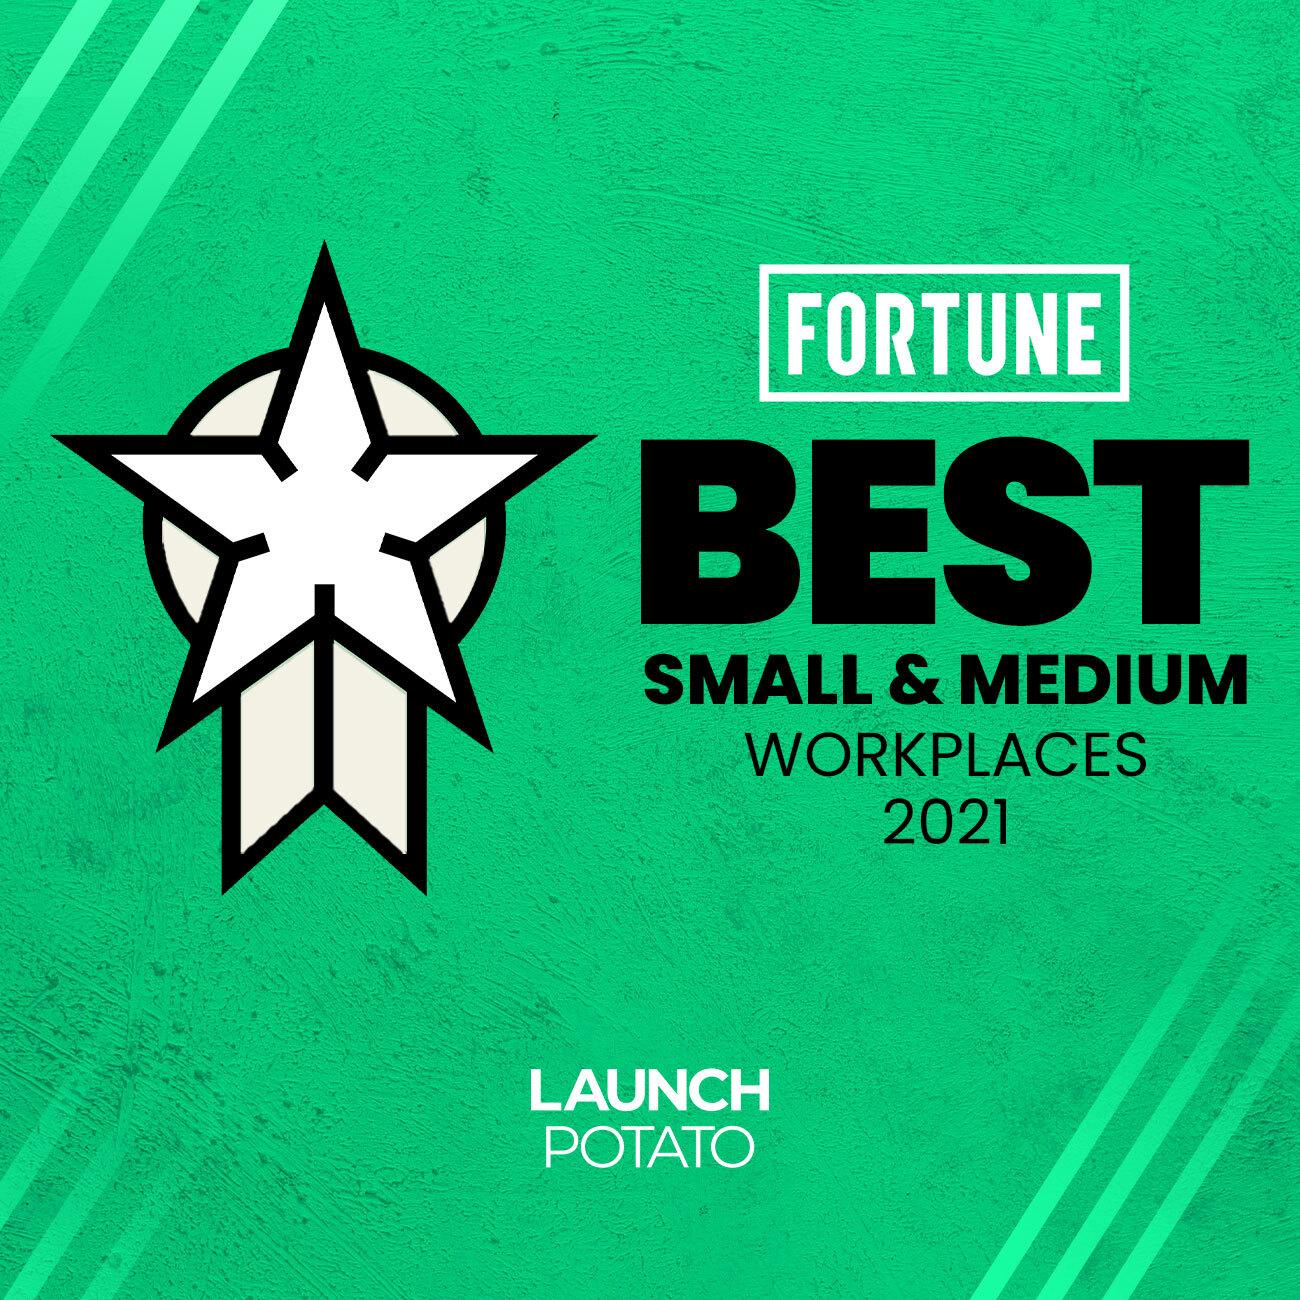 Launch Potato Wins The Sammy